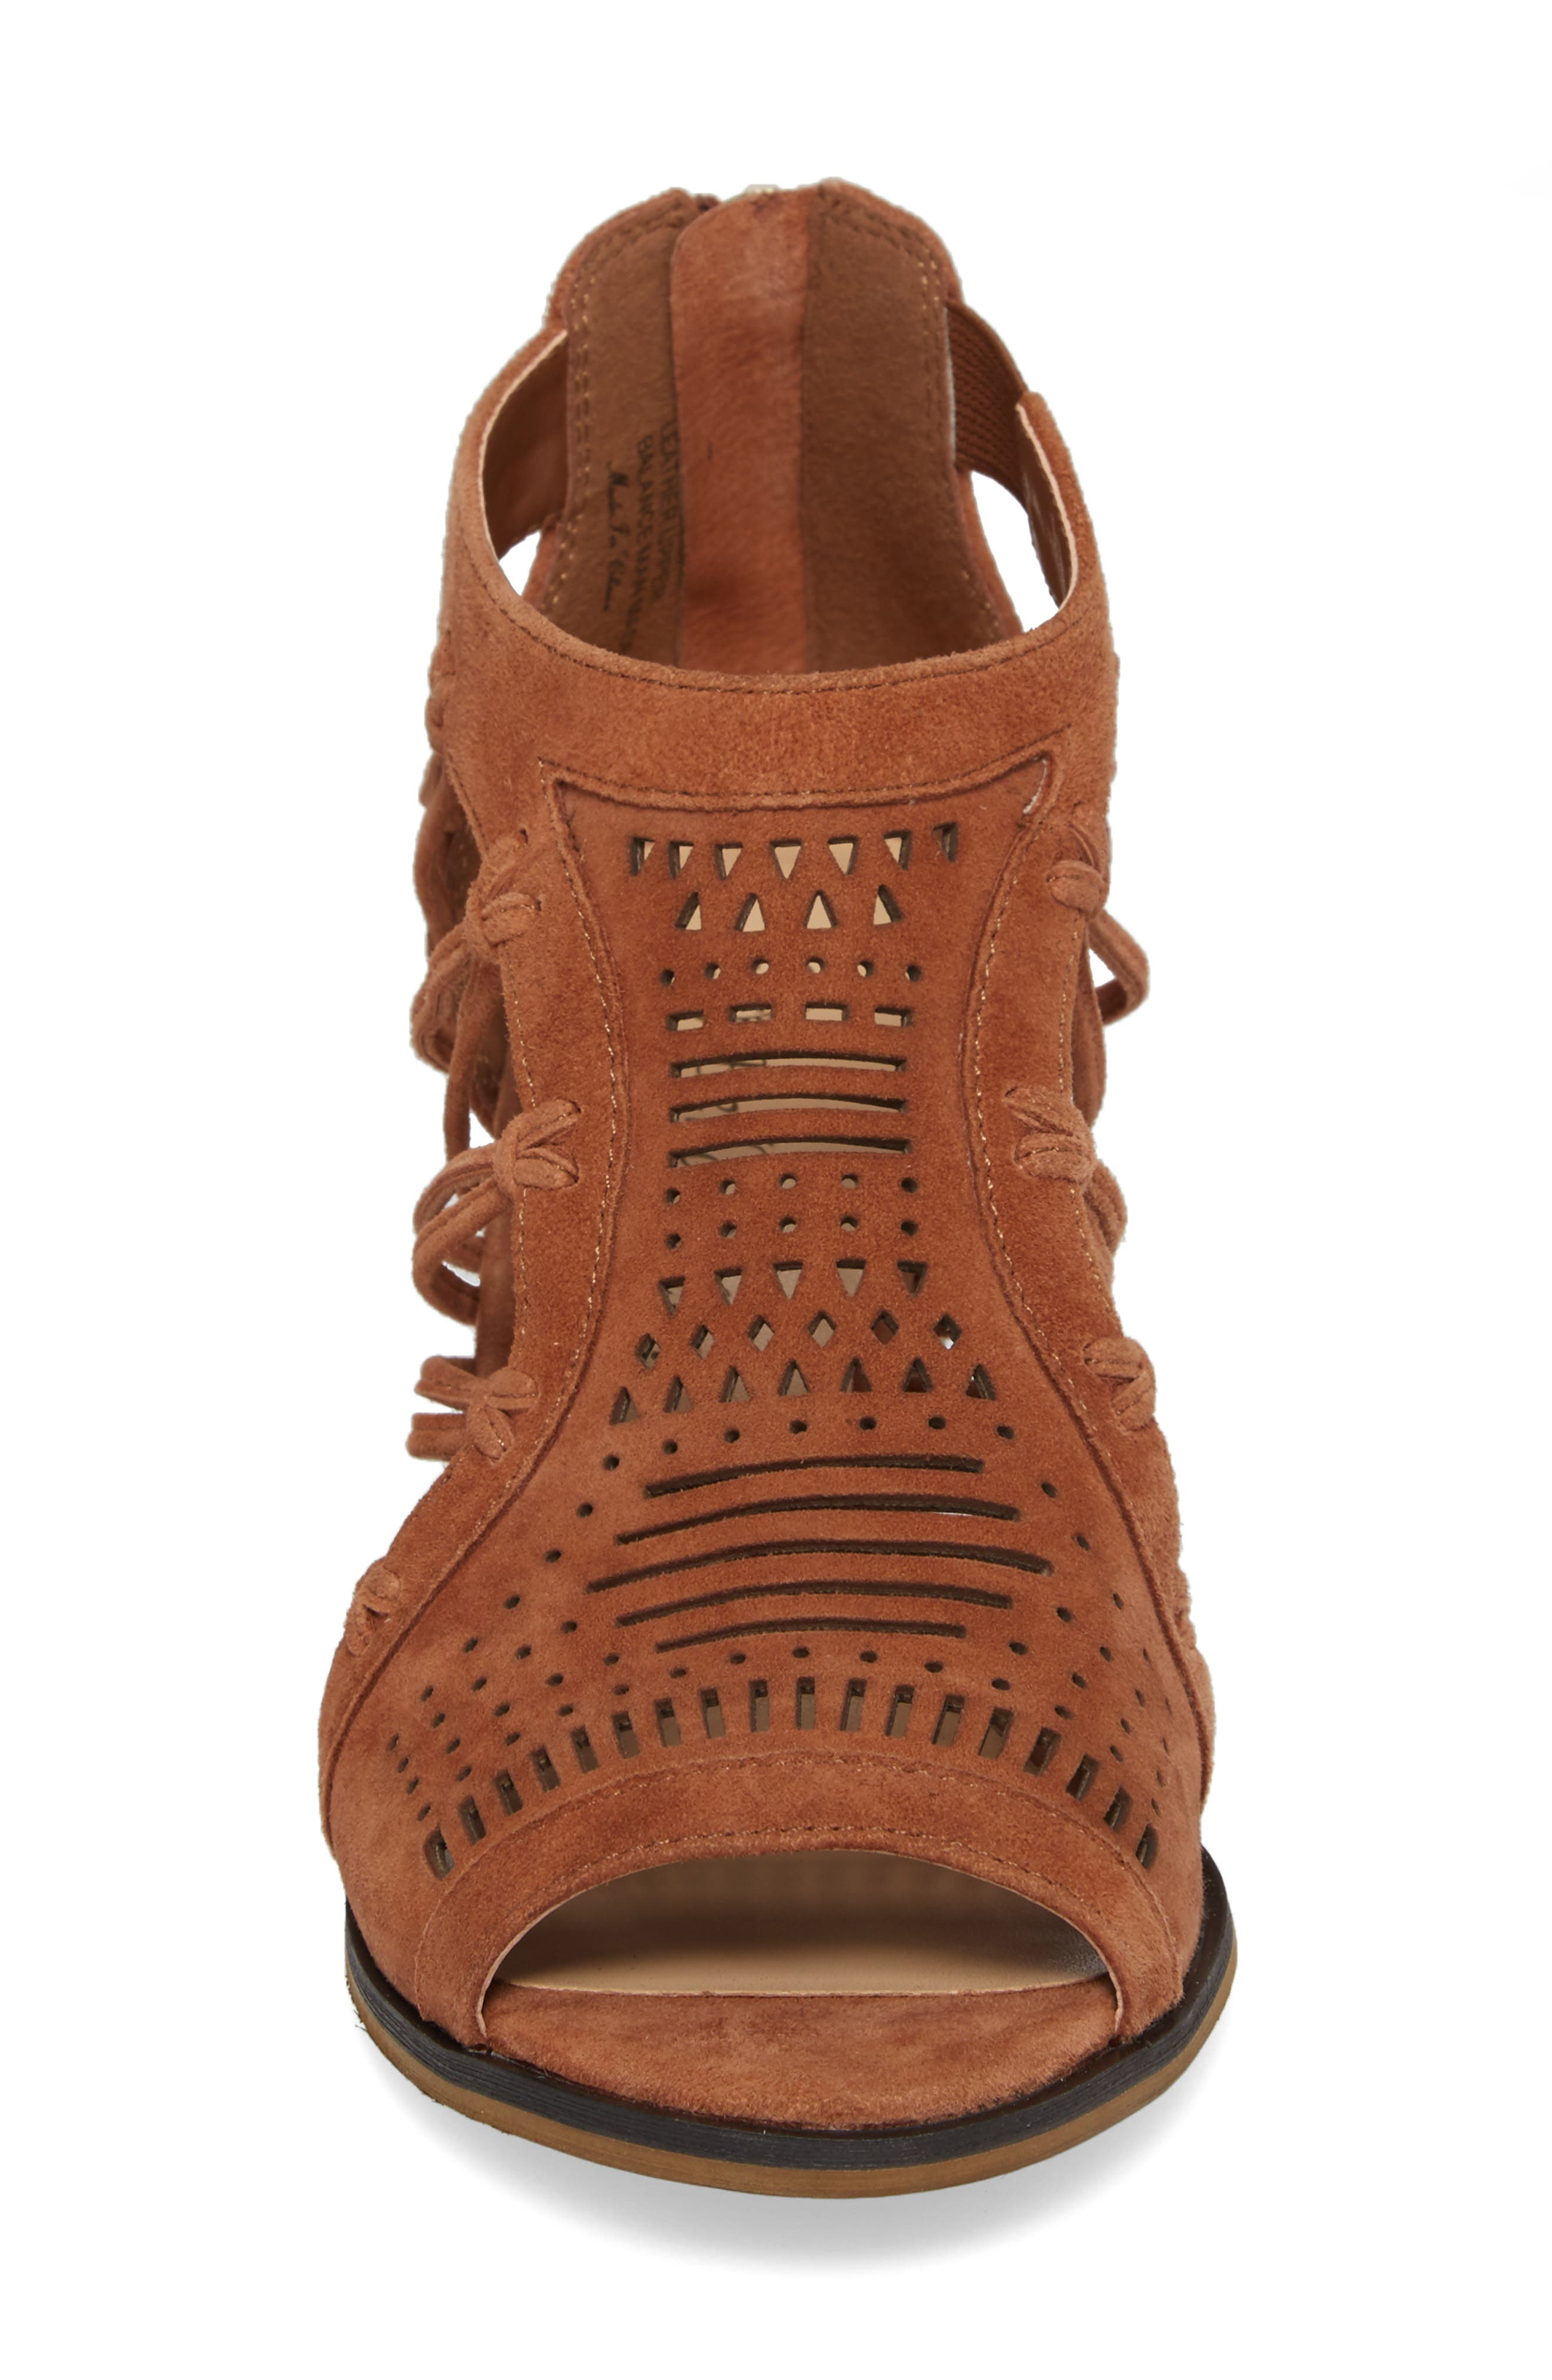 Kortez Block Heel Sandal,                             Alternate thumbnail 4, color,                             Dark Tan Suede